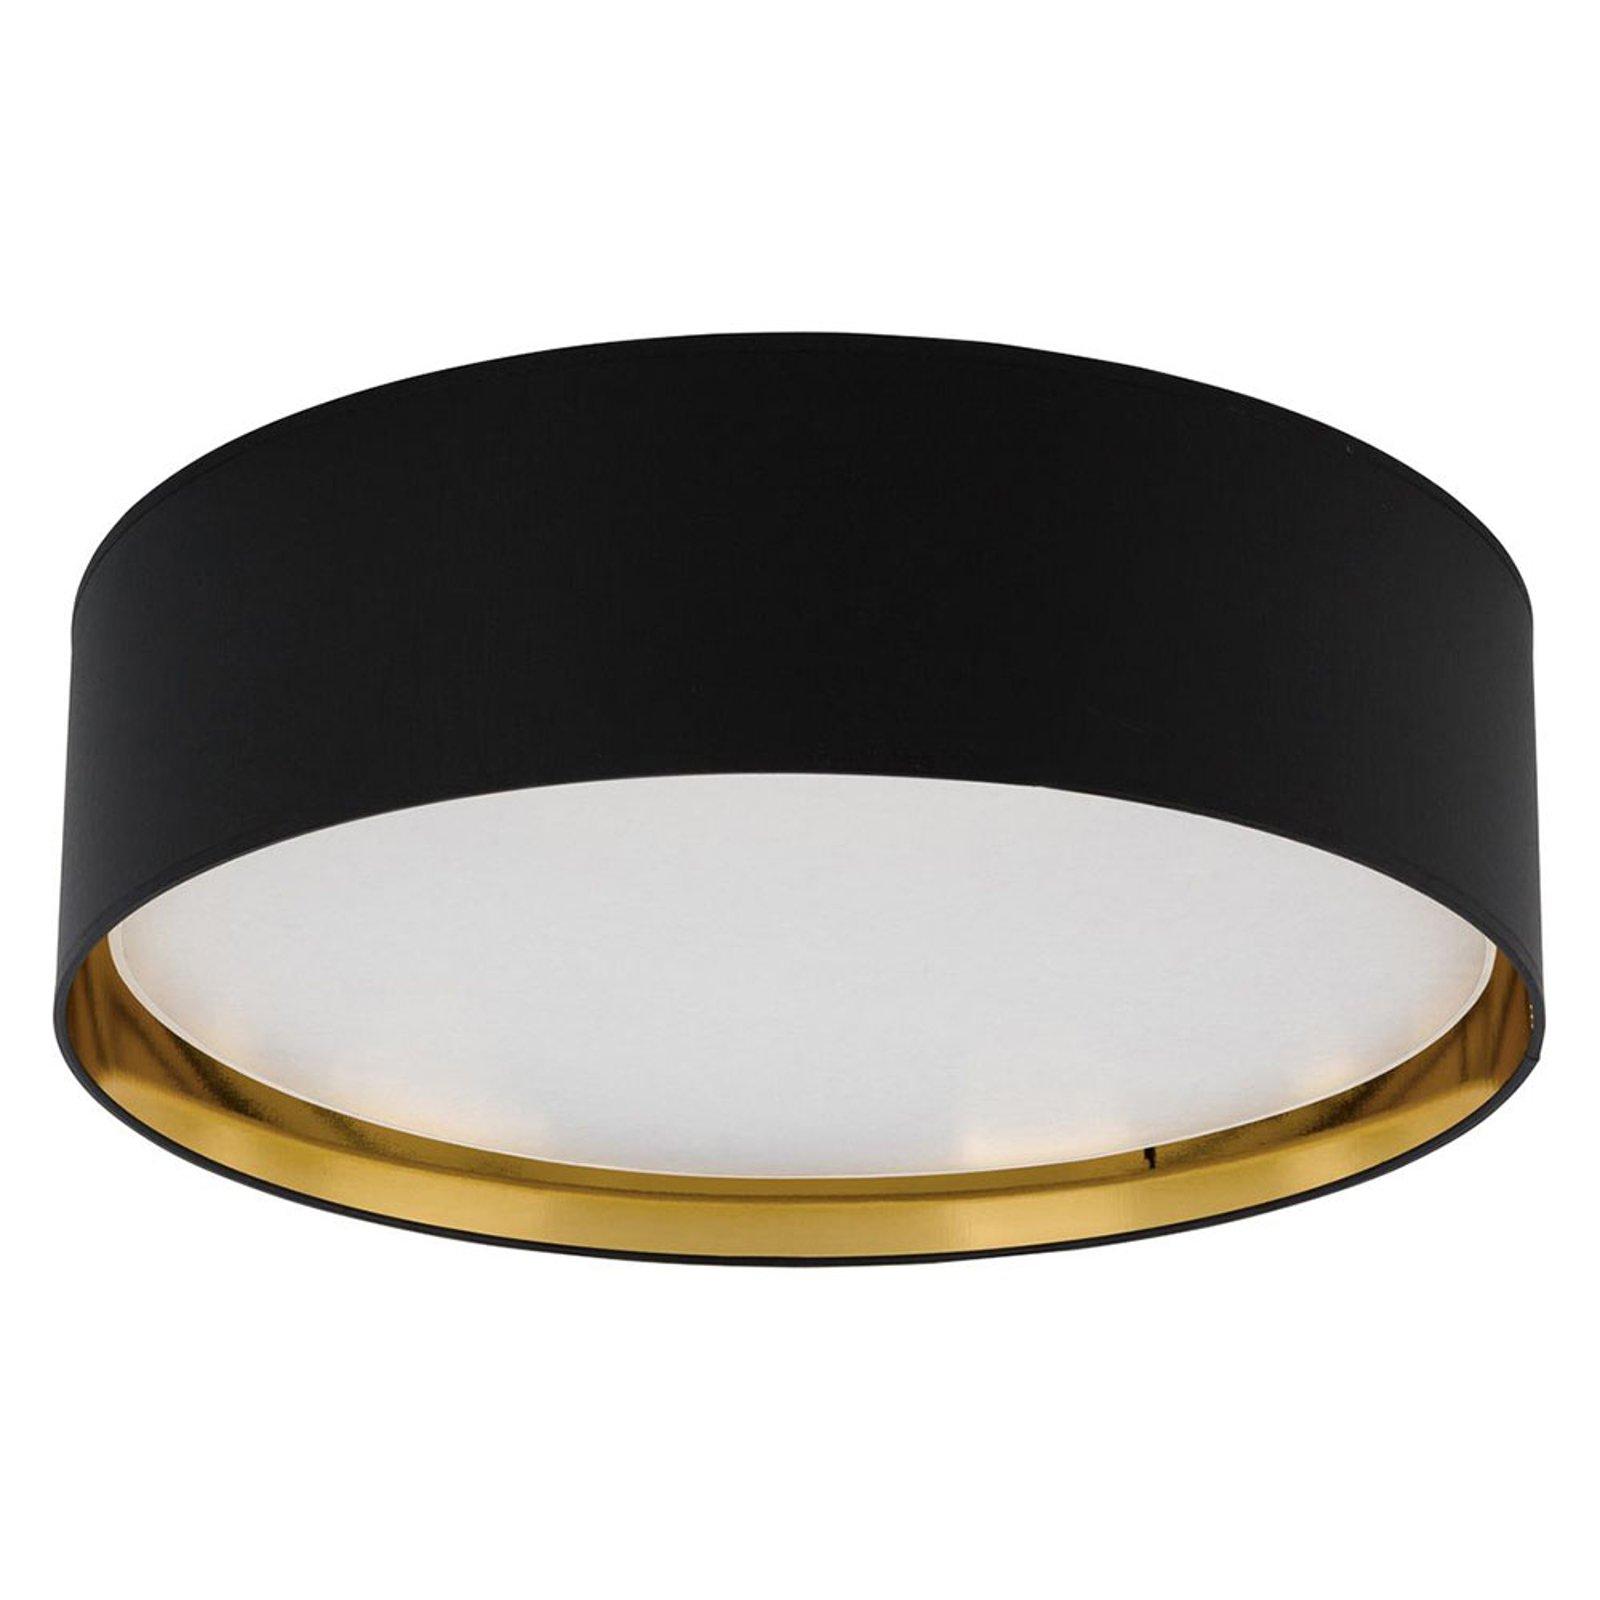 Taklampe Bilbao, Ø 60 cm, svart/hvit